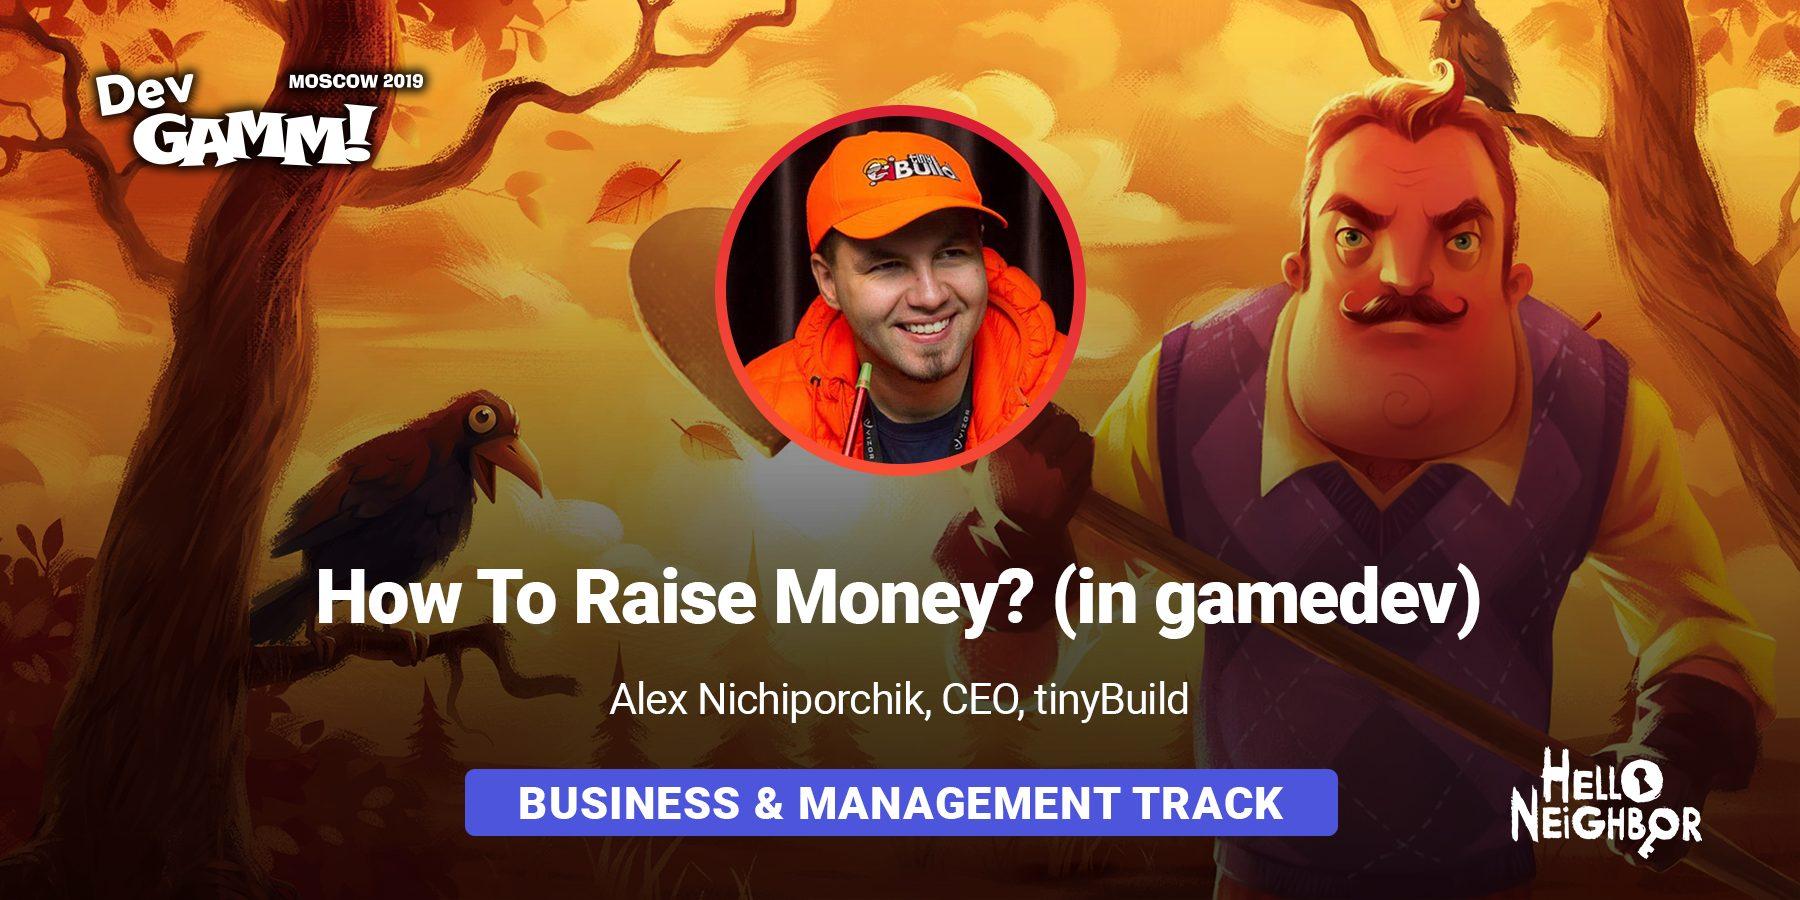 Алекс Ничипорчик об инвестициях и другие доклады про бизнес